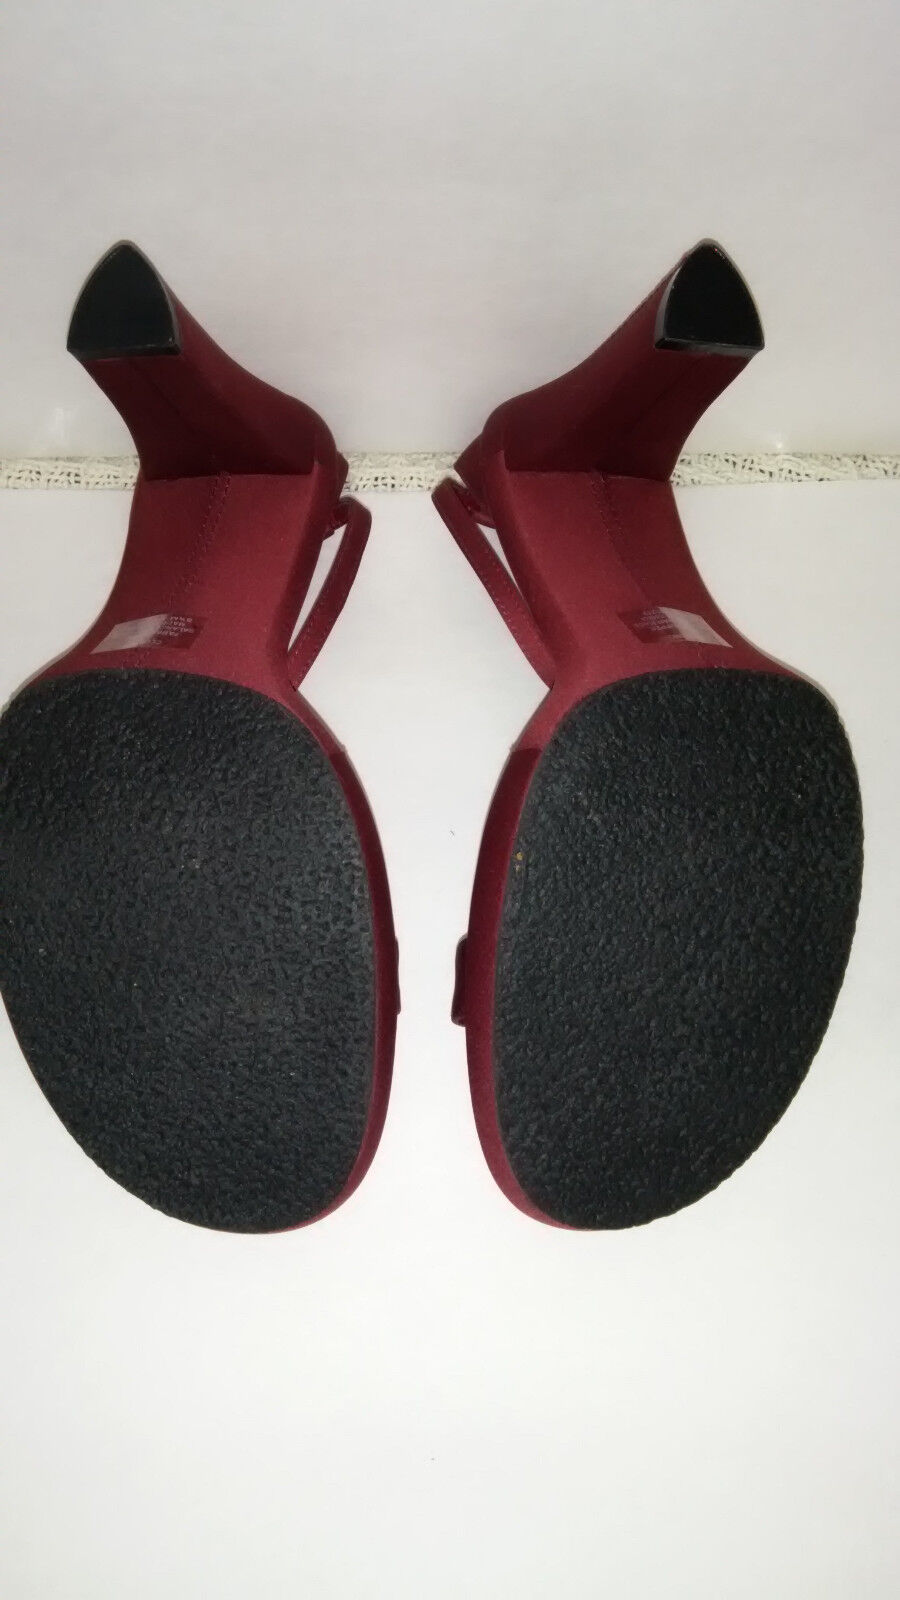 Kenneth Cole son son son acción Rojo Oscuro (elegantemente Enjoyado) - Zapatos de mujer: tamao 8 12 M 4927f5